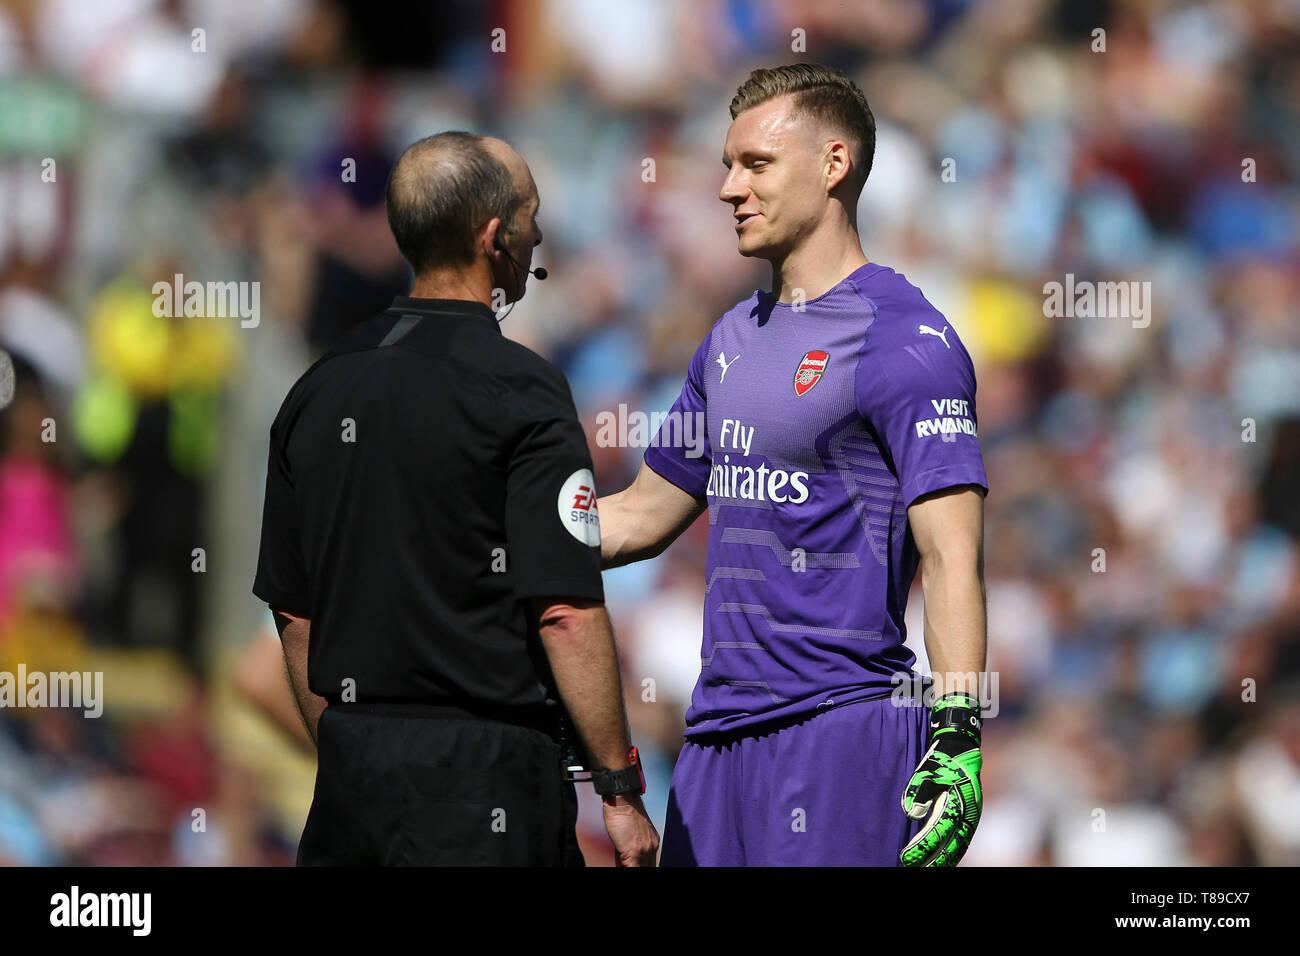 buy popular e1926 13038 Burnley, UK. 12th May, 2019. Arsenal Goalkeeper Bernd Leno ...